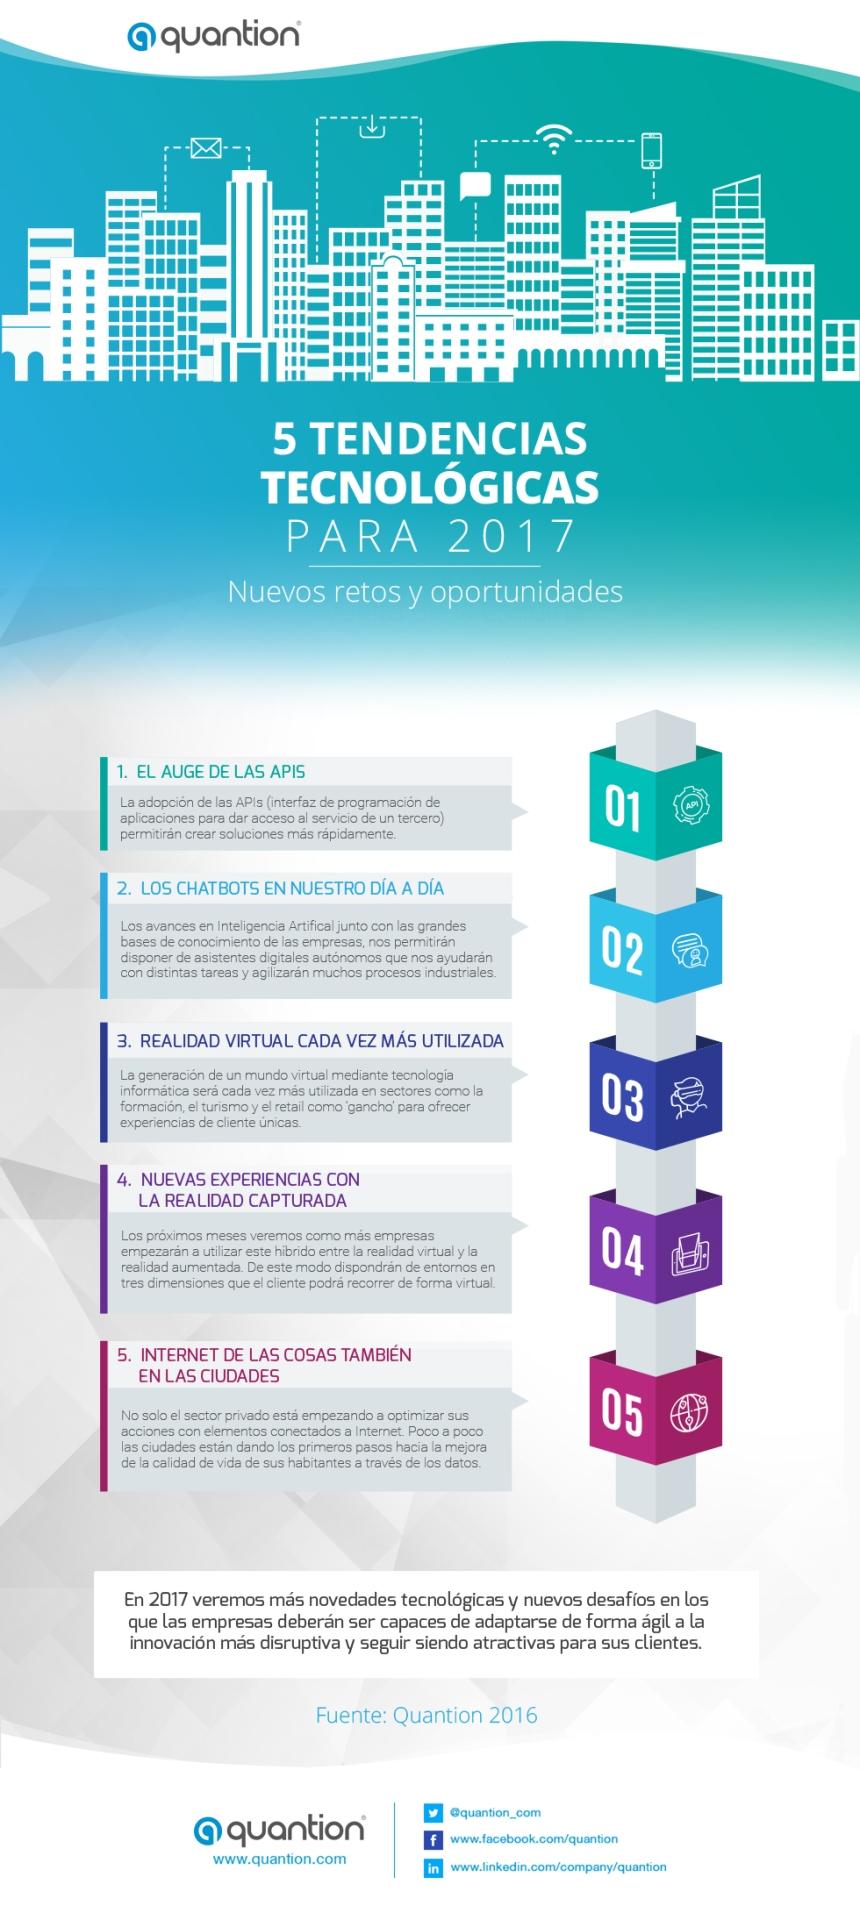 5 Tendencias Tecnológicas para 2017